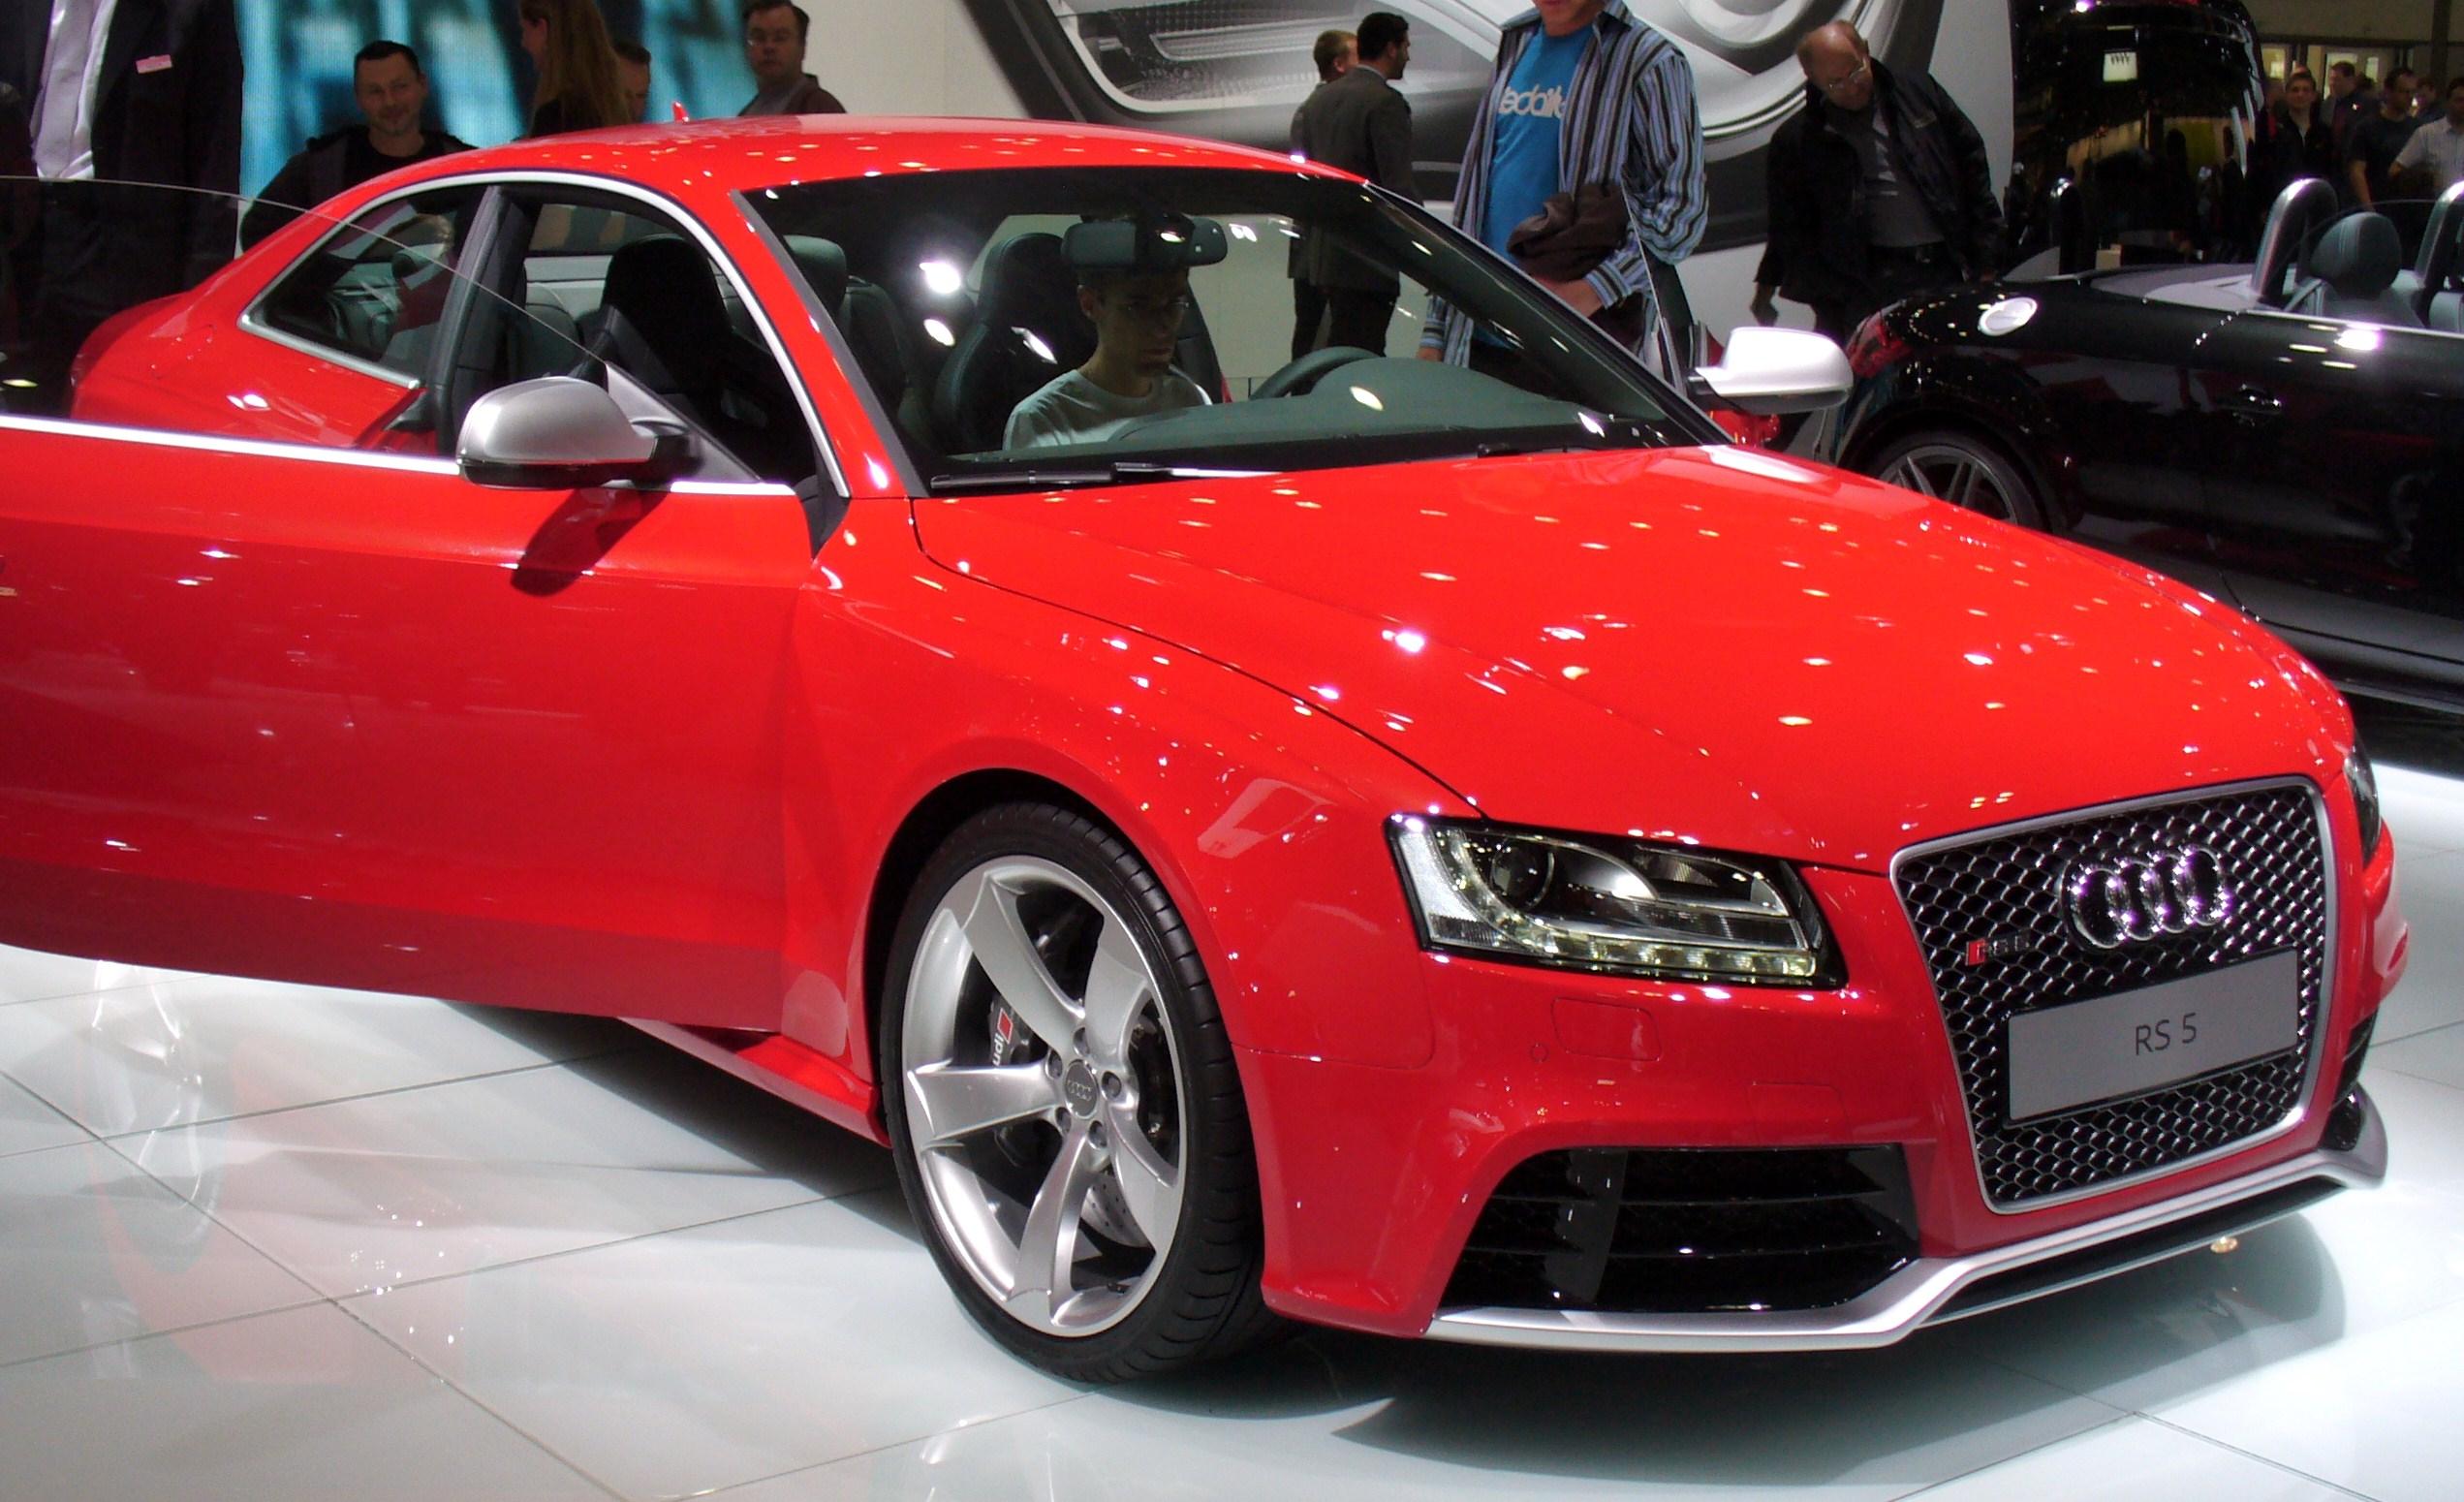 File:Audi RS5 Coupé.JPG - Wikimedia Commons